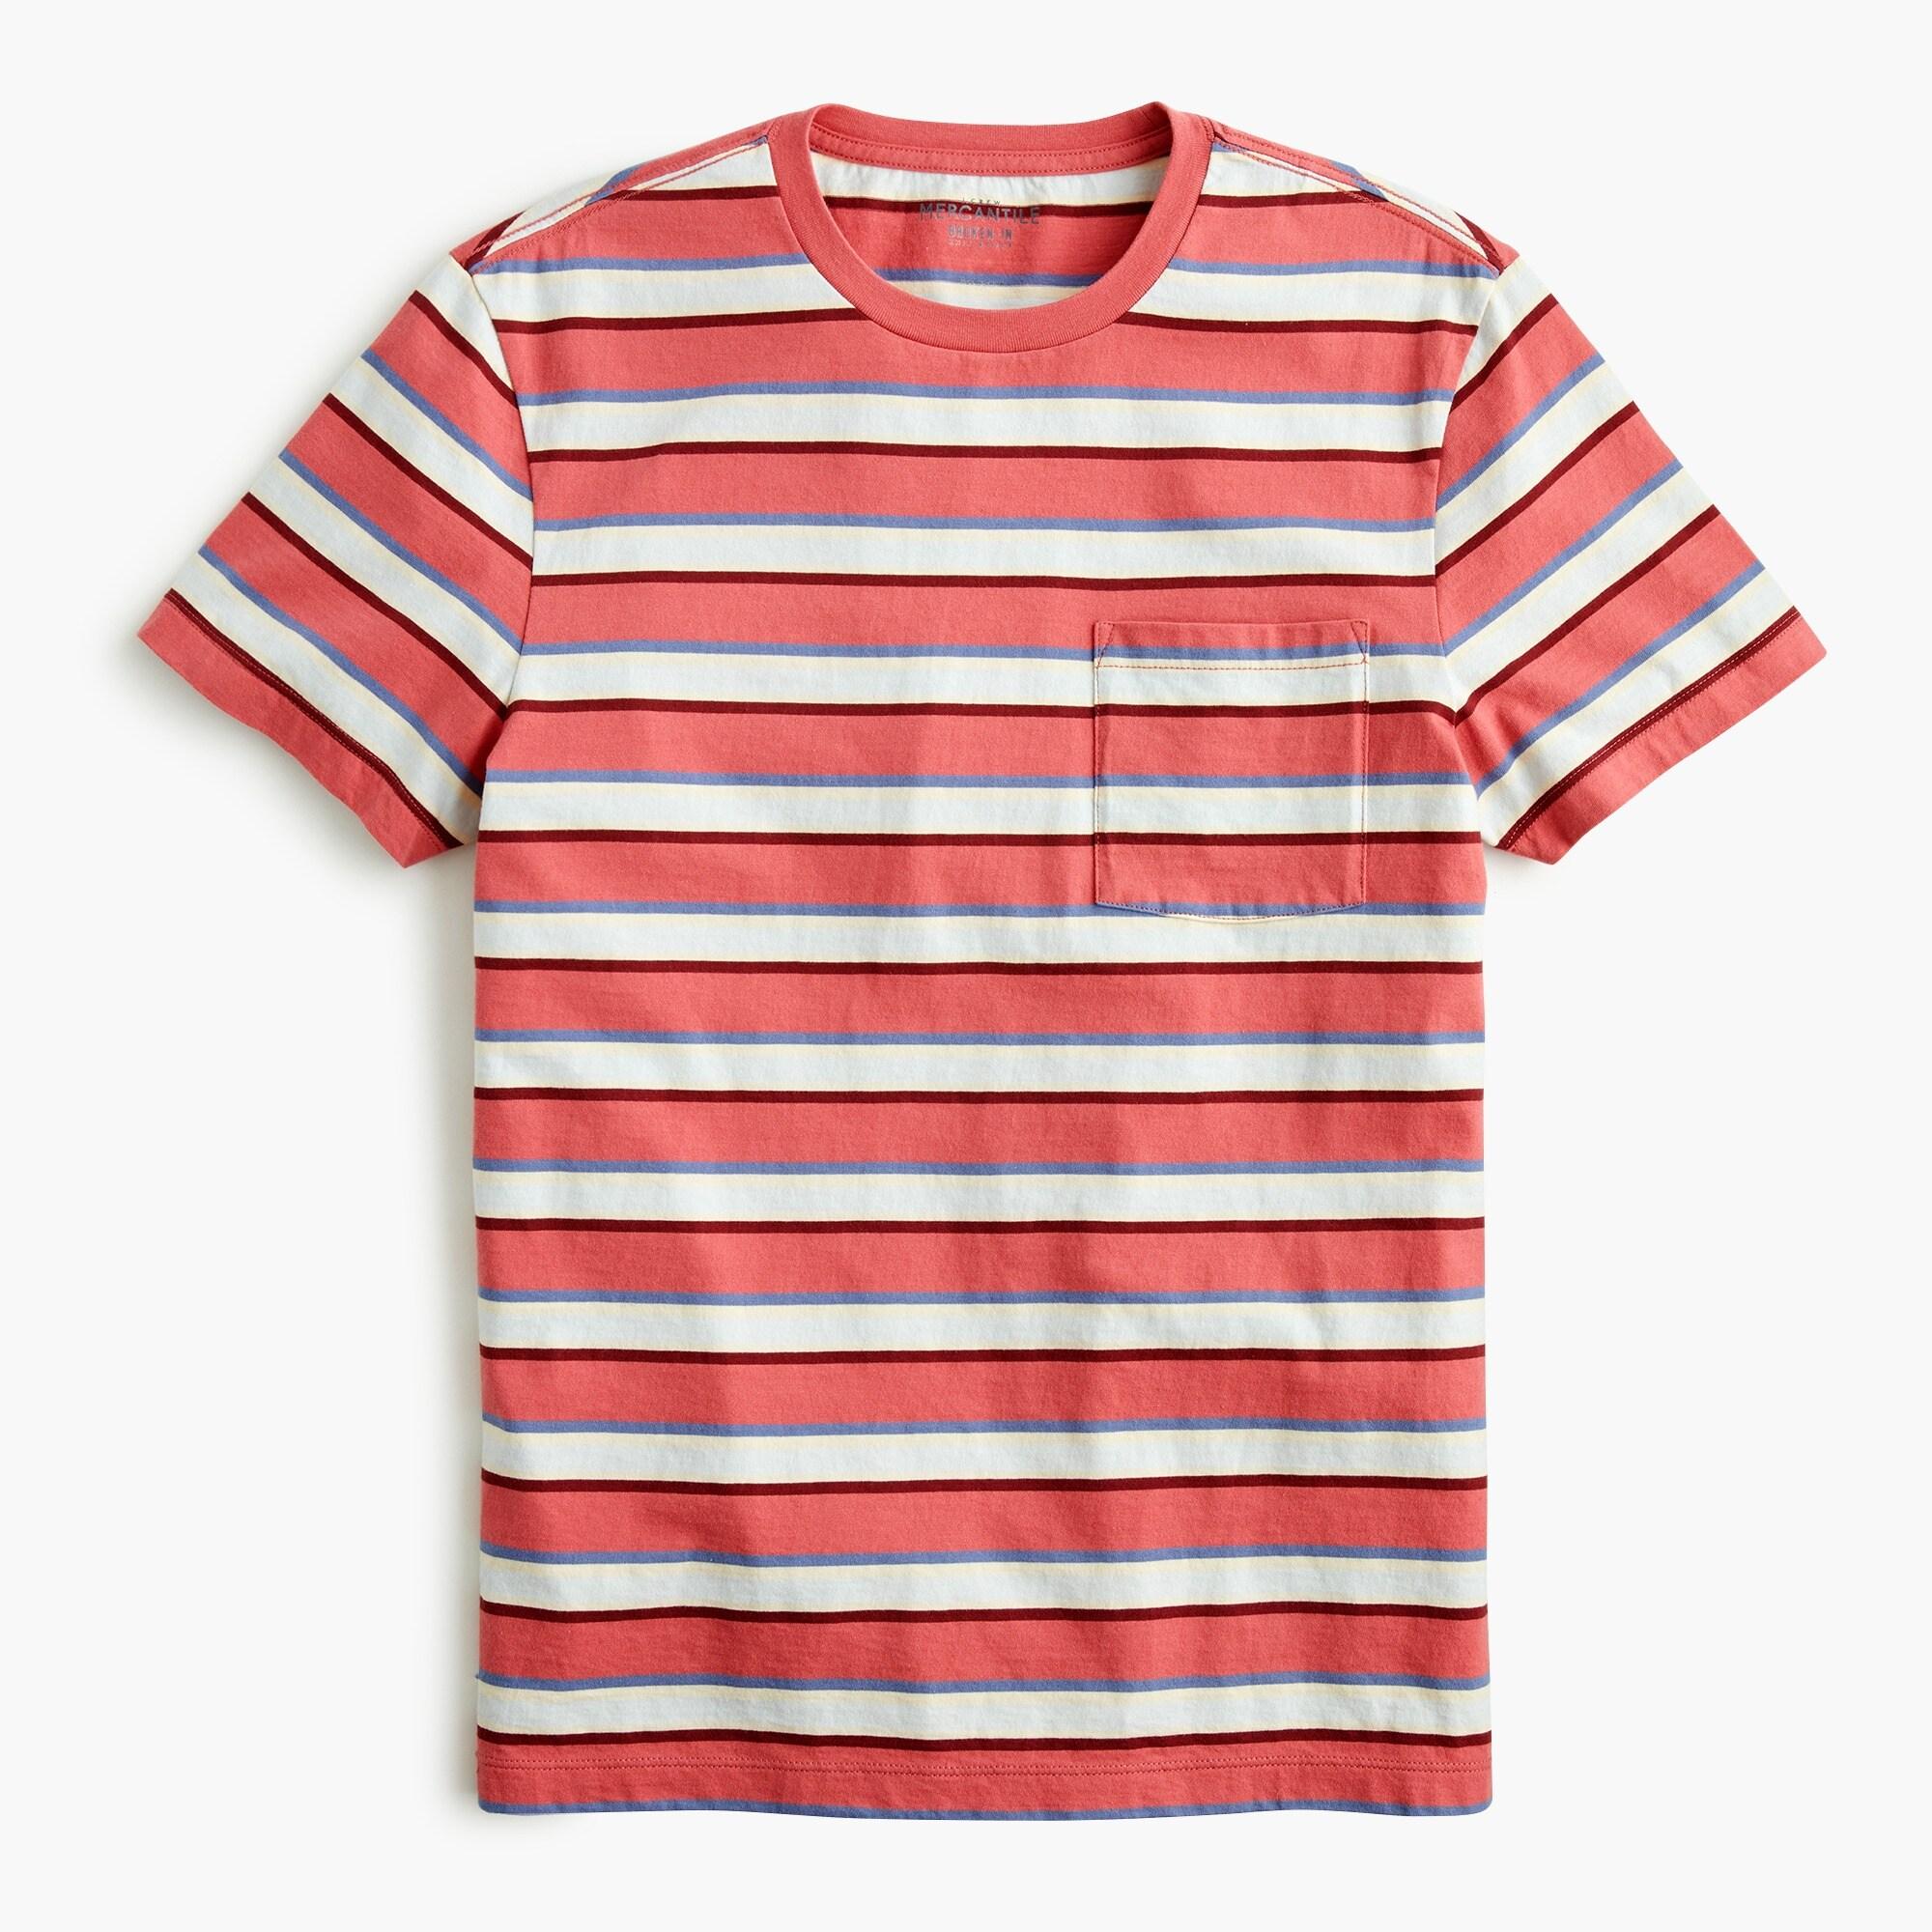 mens Essential pocket T-shirt in stripe